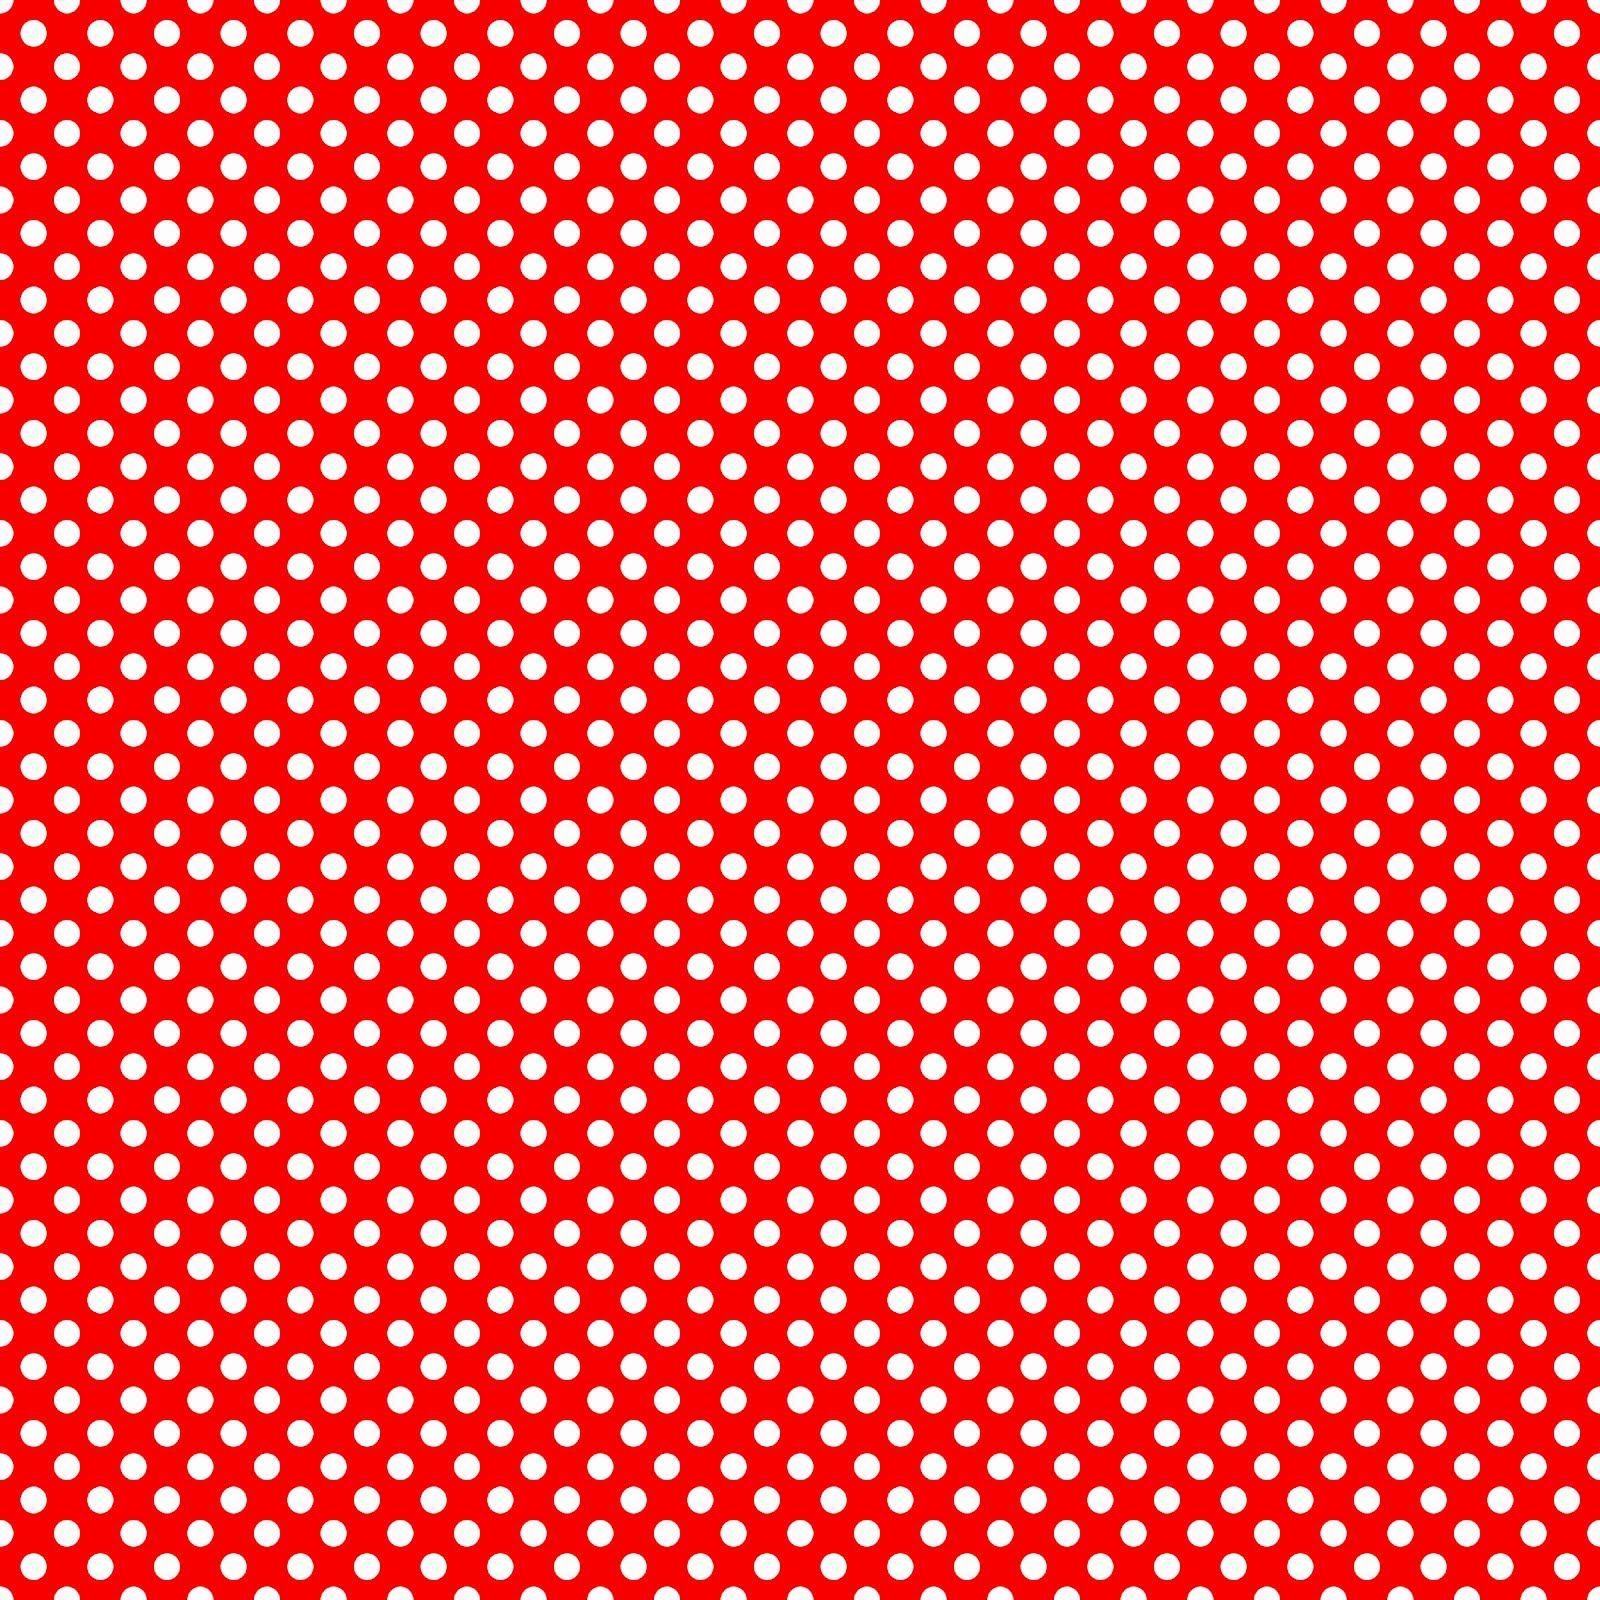 Masterly Vintage Digital Free Digital Scrapbook Paper Big Red Free Vintage Digital Free Digital Scrapbook Paper Big Free Digital Scrapbook Paper Commercial Use Digital Scrapbook Paper Floral photos Digital Scrapbook Paper